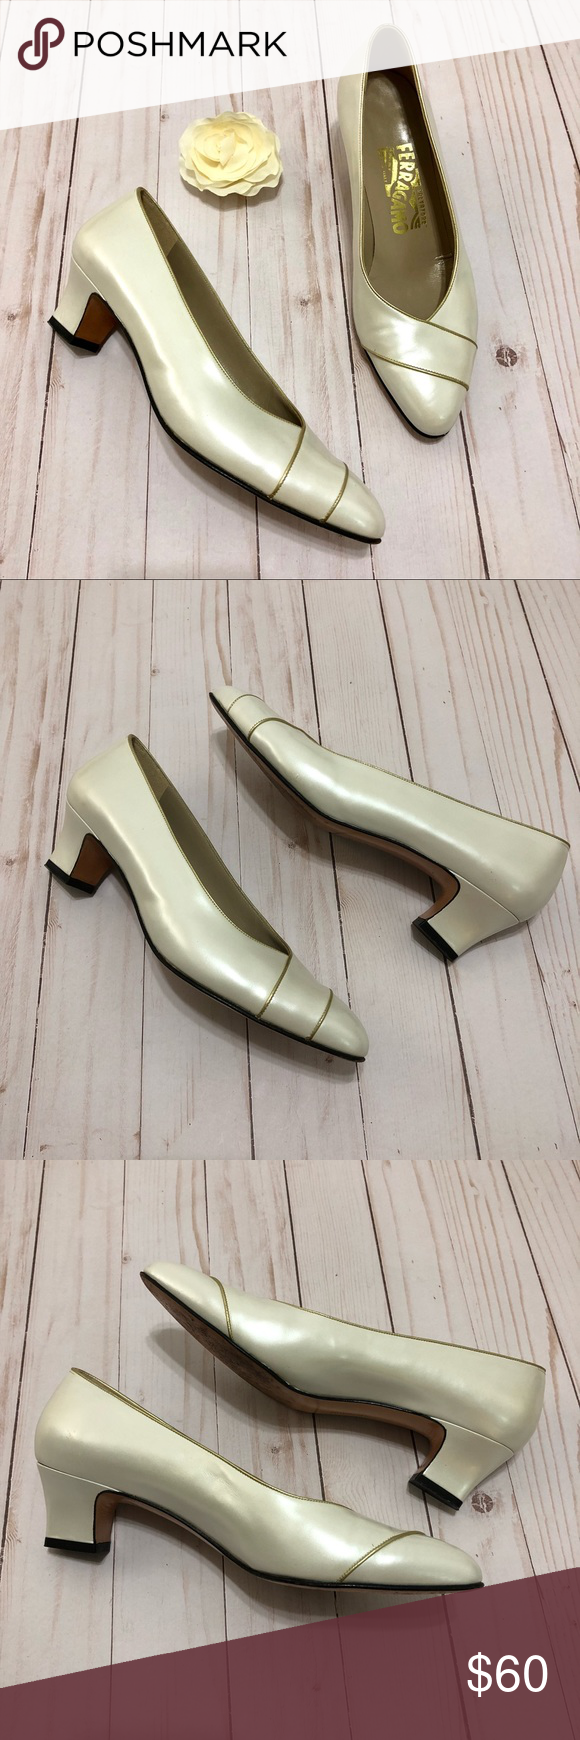 140b284e17 Salvatore Ferragamo Heels Ivory Pearl Gold Trim Salvatore Ferragamo Heels  Ivory Pearl Gold Trim Pumps Size 7. 1.75 inch heel. Great preloved  condition.